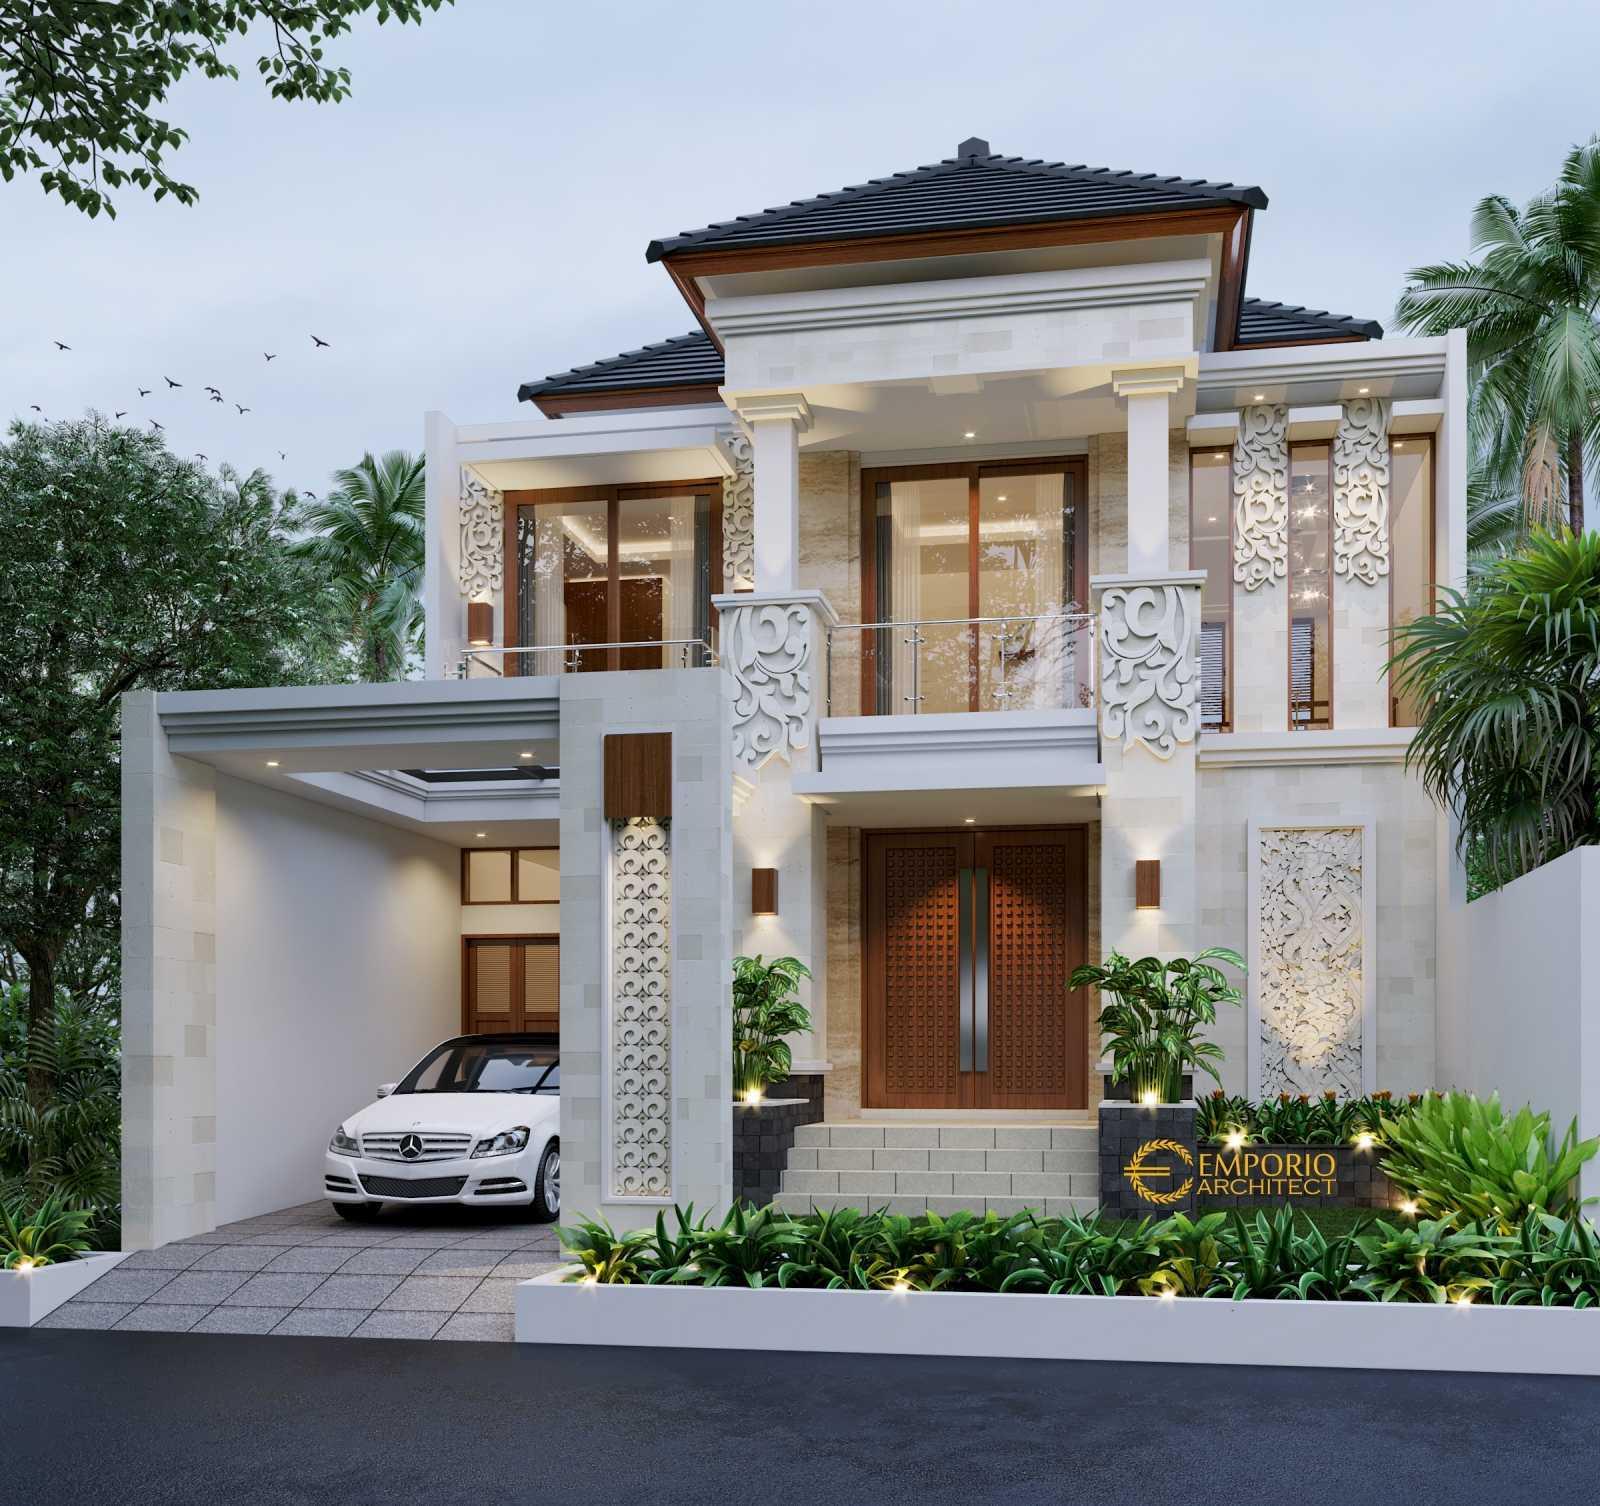 Emporio Architect Desain Rumah Villa Bali Tropis 609 @ Cikarang, Bekasi Cikarang, Bekasi, Jawa Barat, Indonesia Cikarang, Bekasi, Jawa Barat, Indonesia Emporio-Architect-Desain-Rumah-Villa-Bali-Tropis-609-Cikarang-Bekasi Tropical 77528